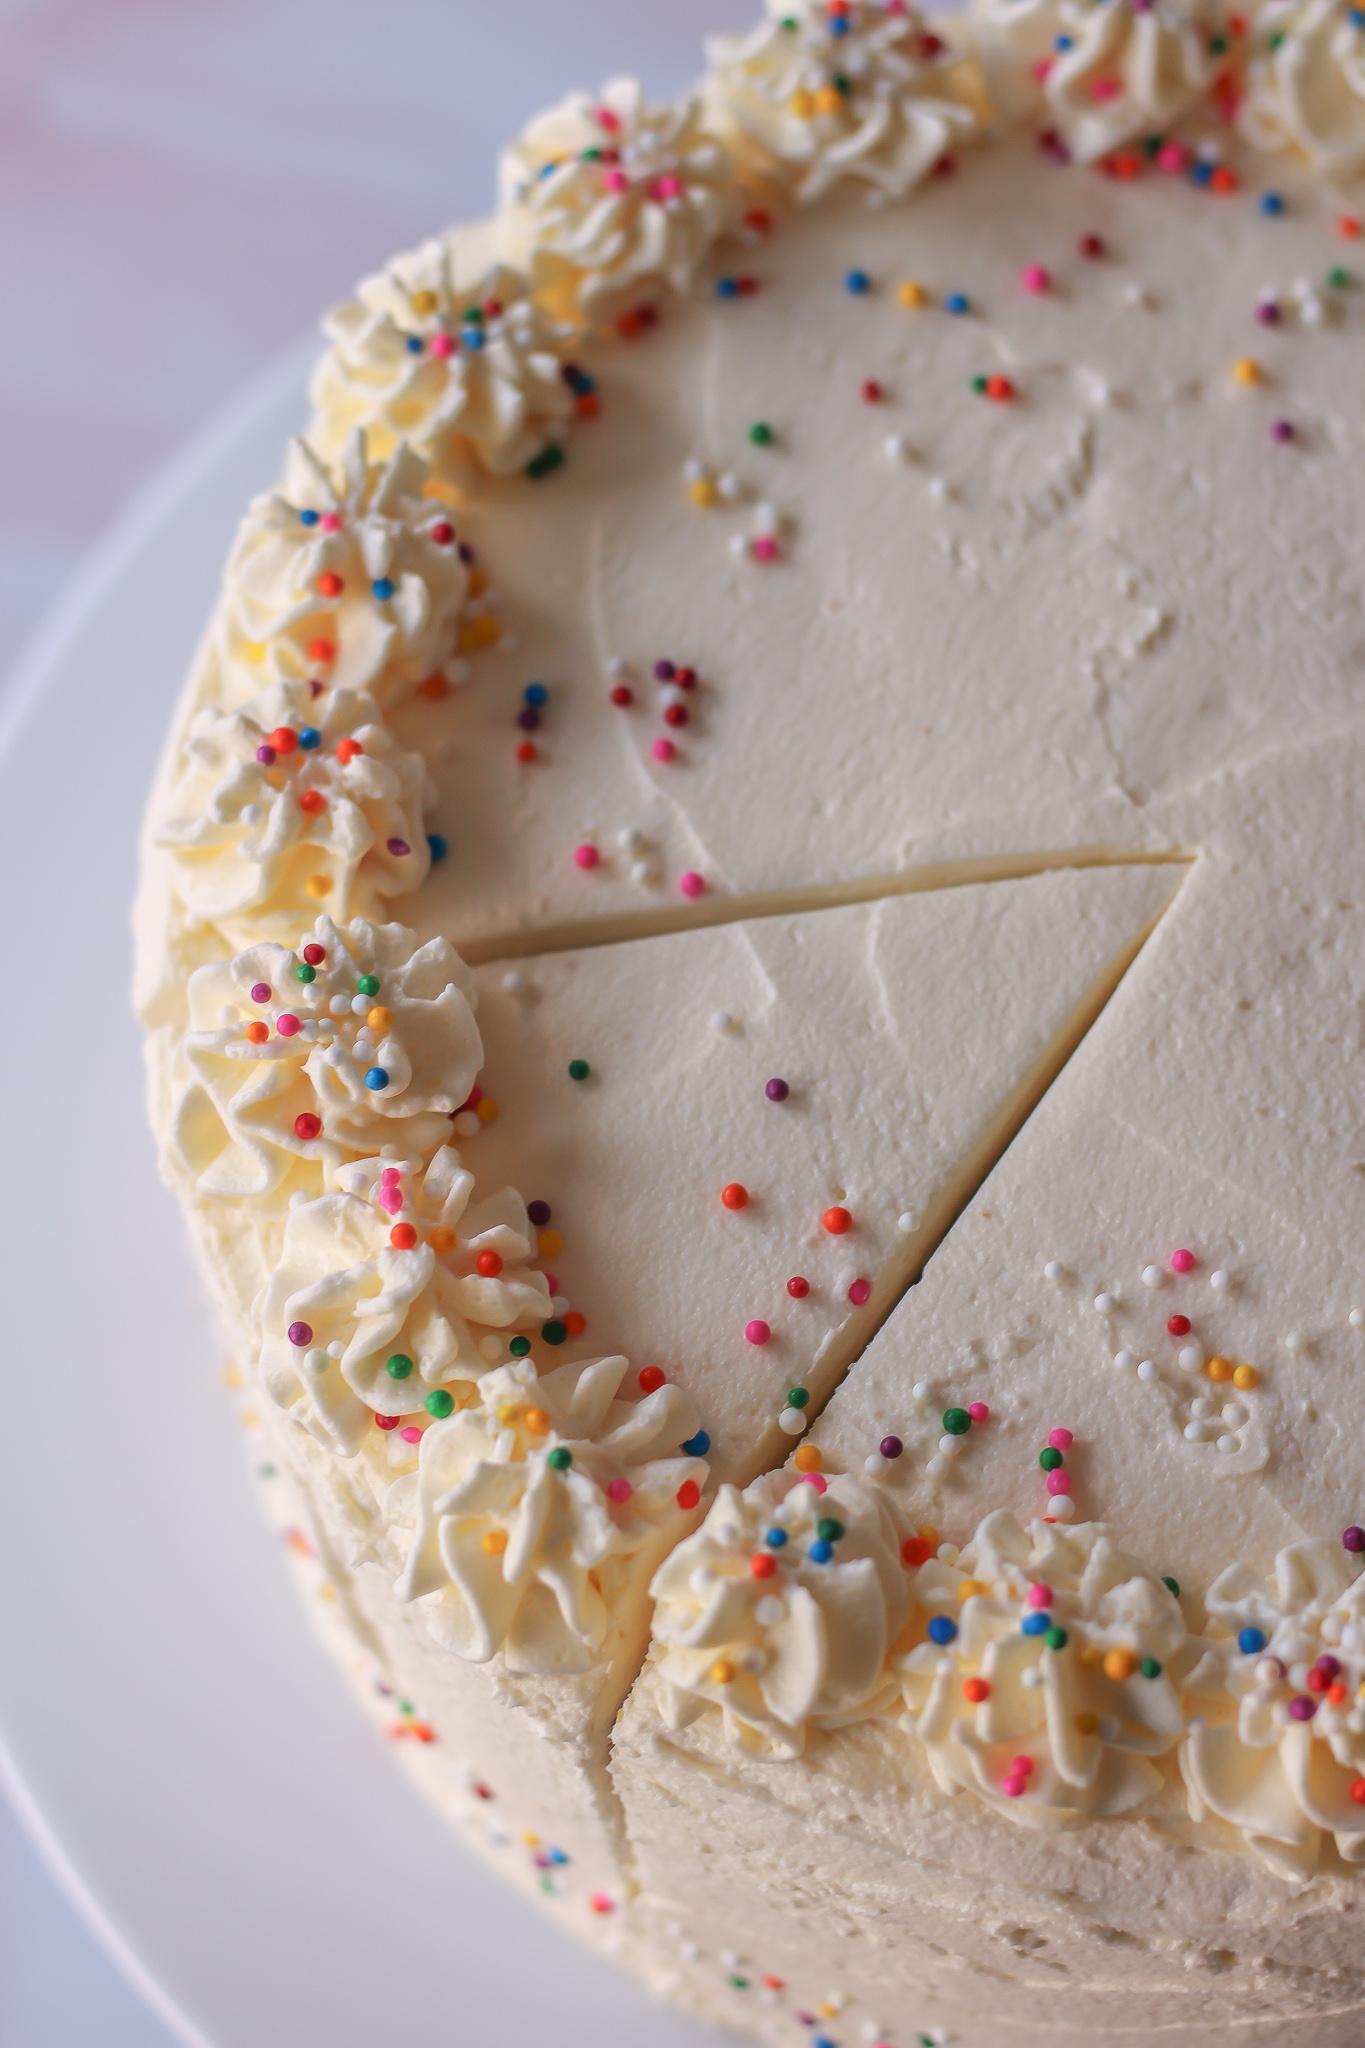 sliced vanilla layer cake with vanilla buttercream, where slice hasn't been removed yet